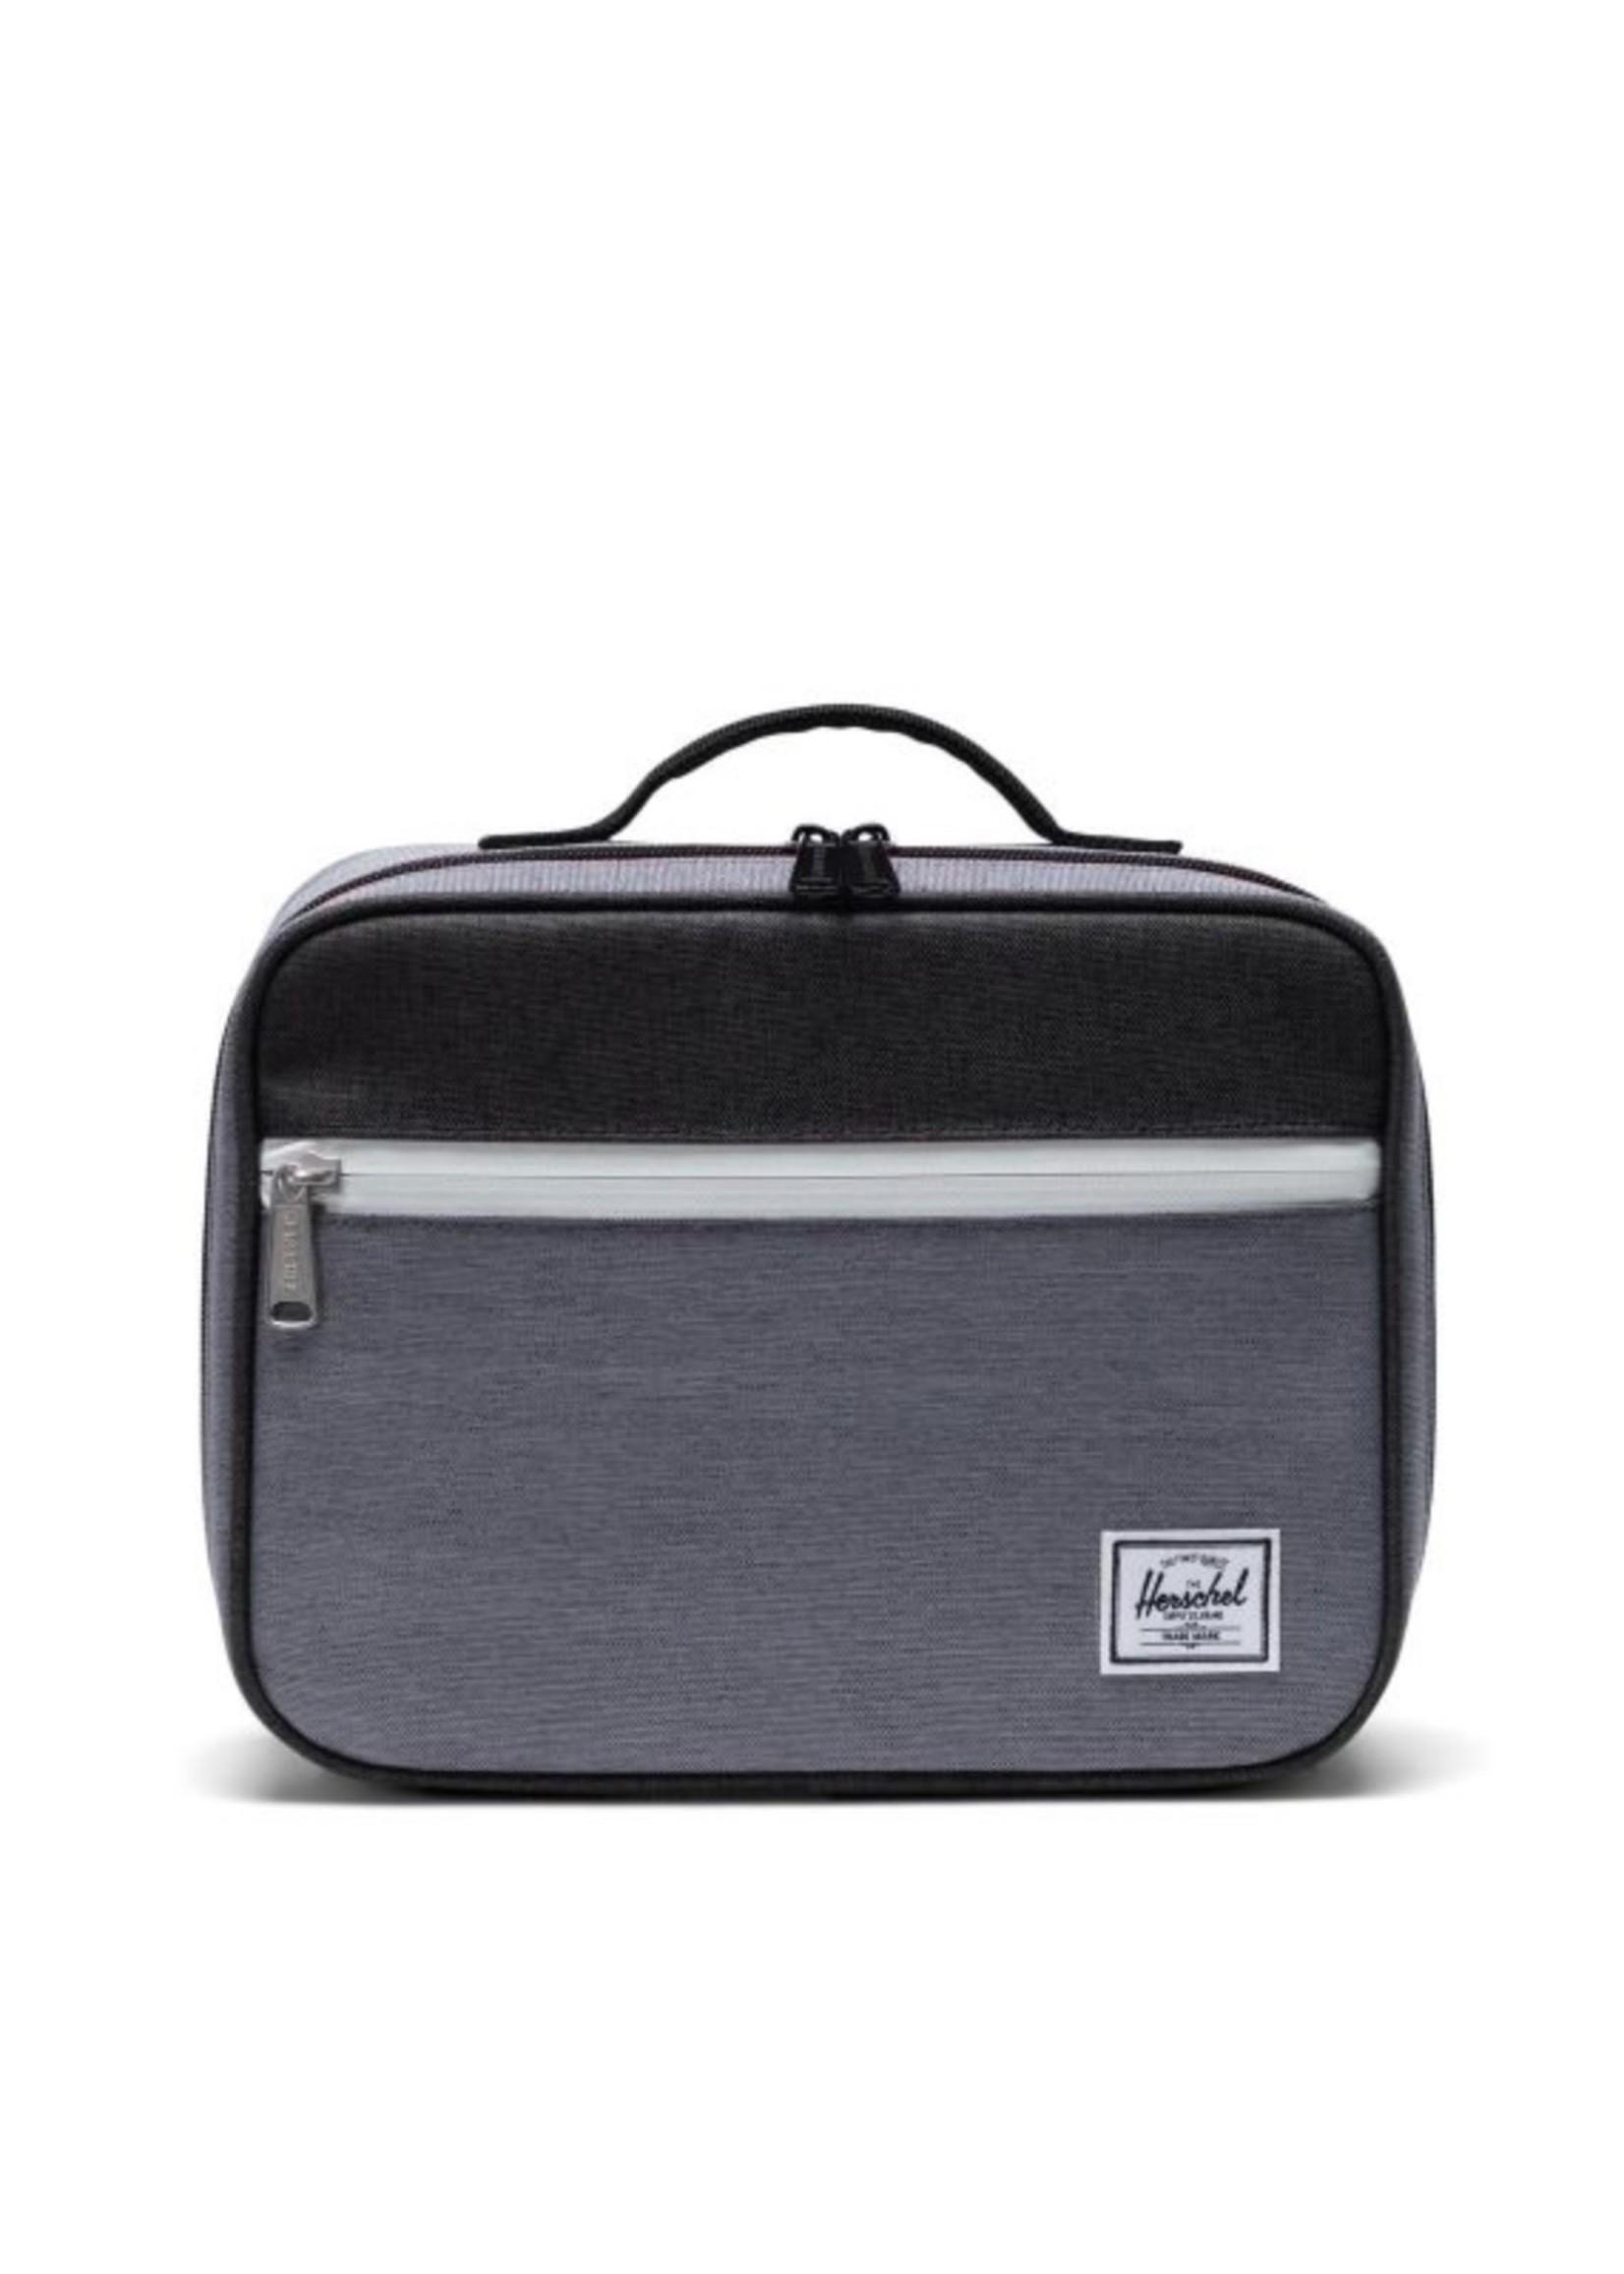 Herschel Supply Co. Pop Quiz Lunch Box   Insulated in Mid Grey Crosshatch/Black Crosshatch